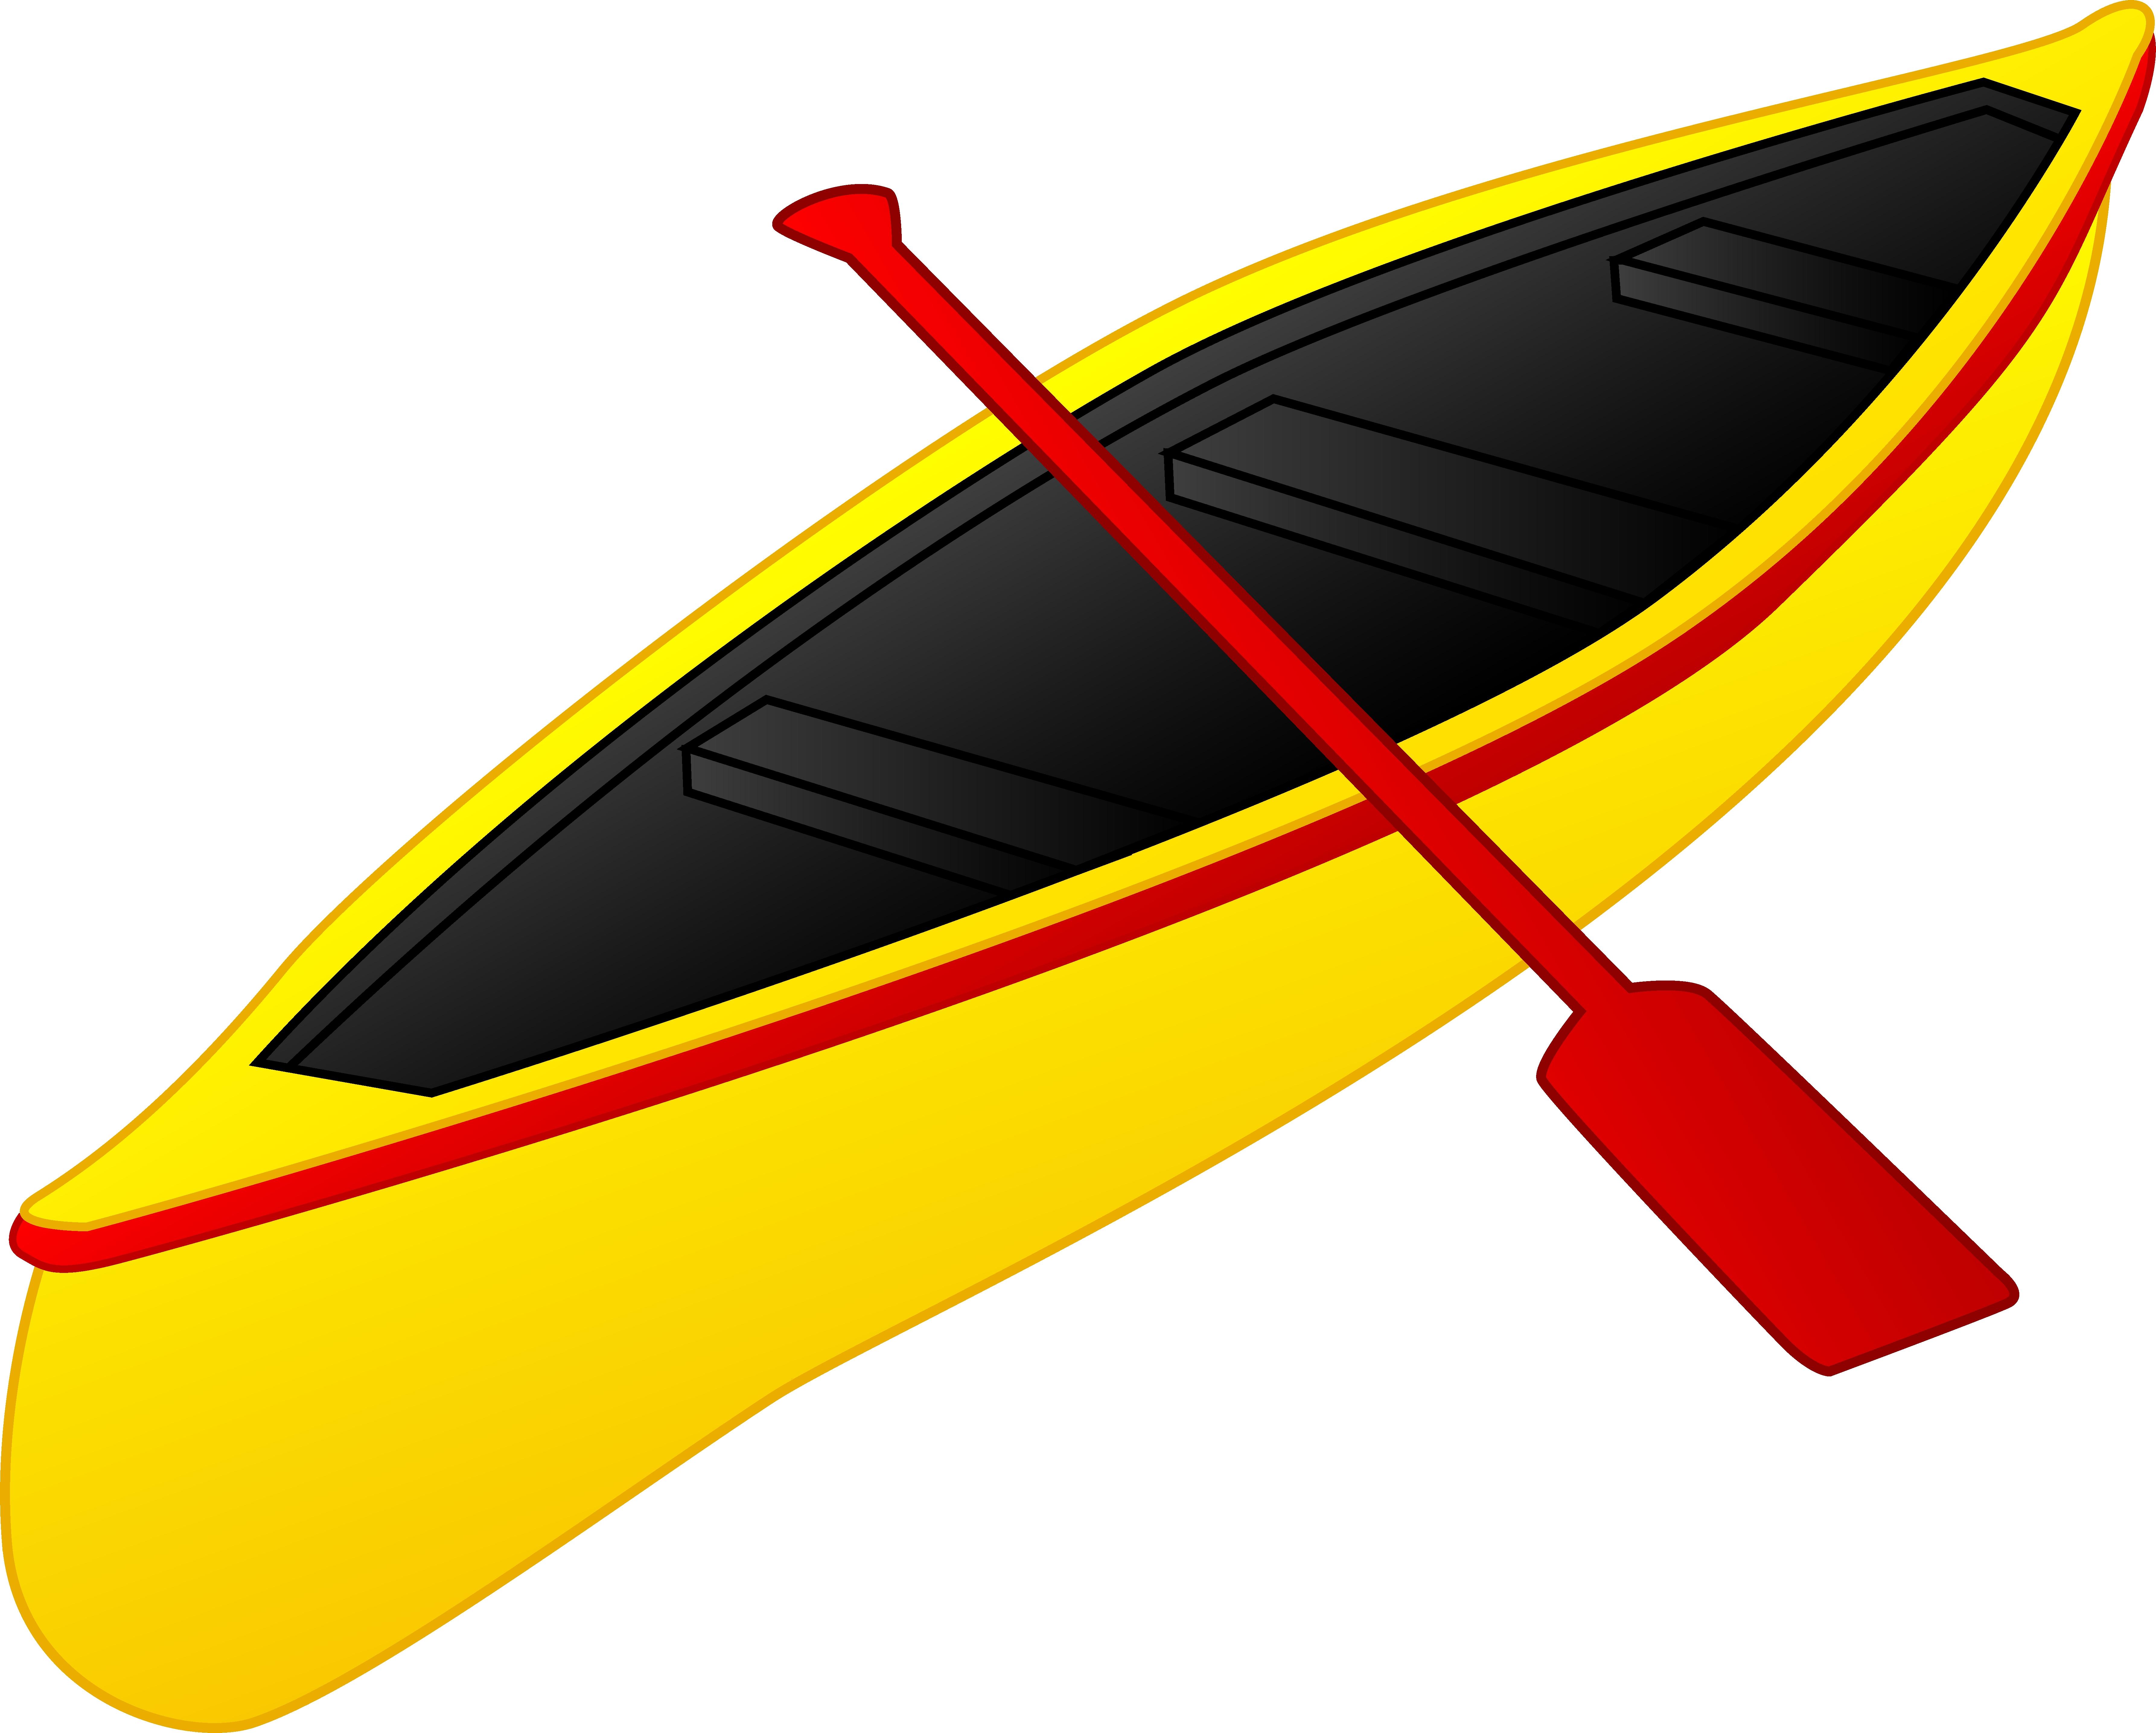 7144x5744 Unique Canoe Clipart Design